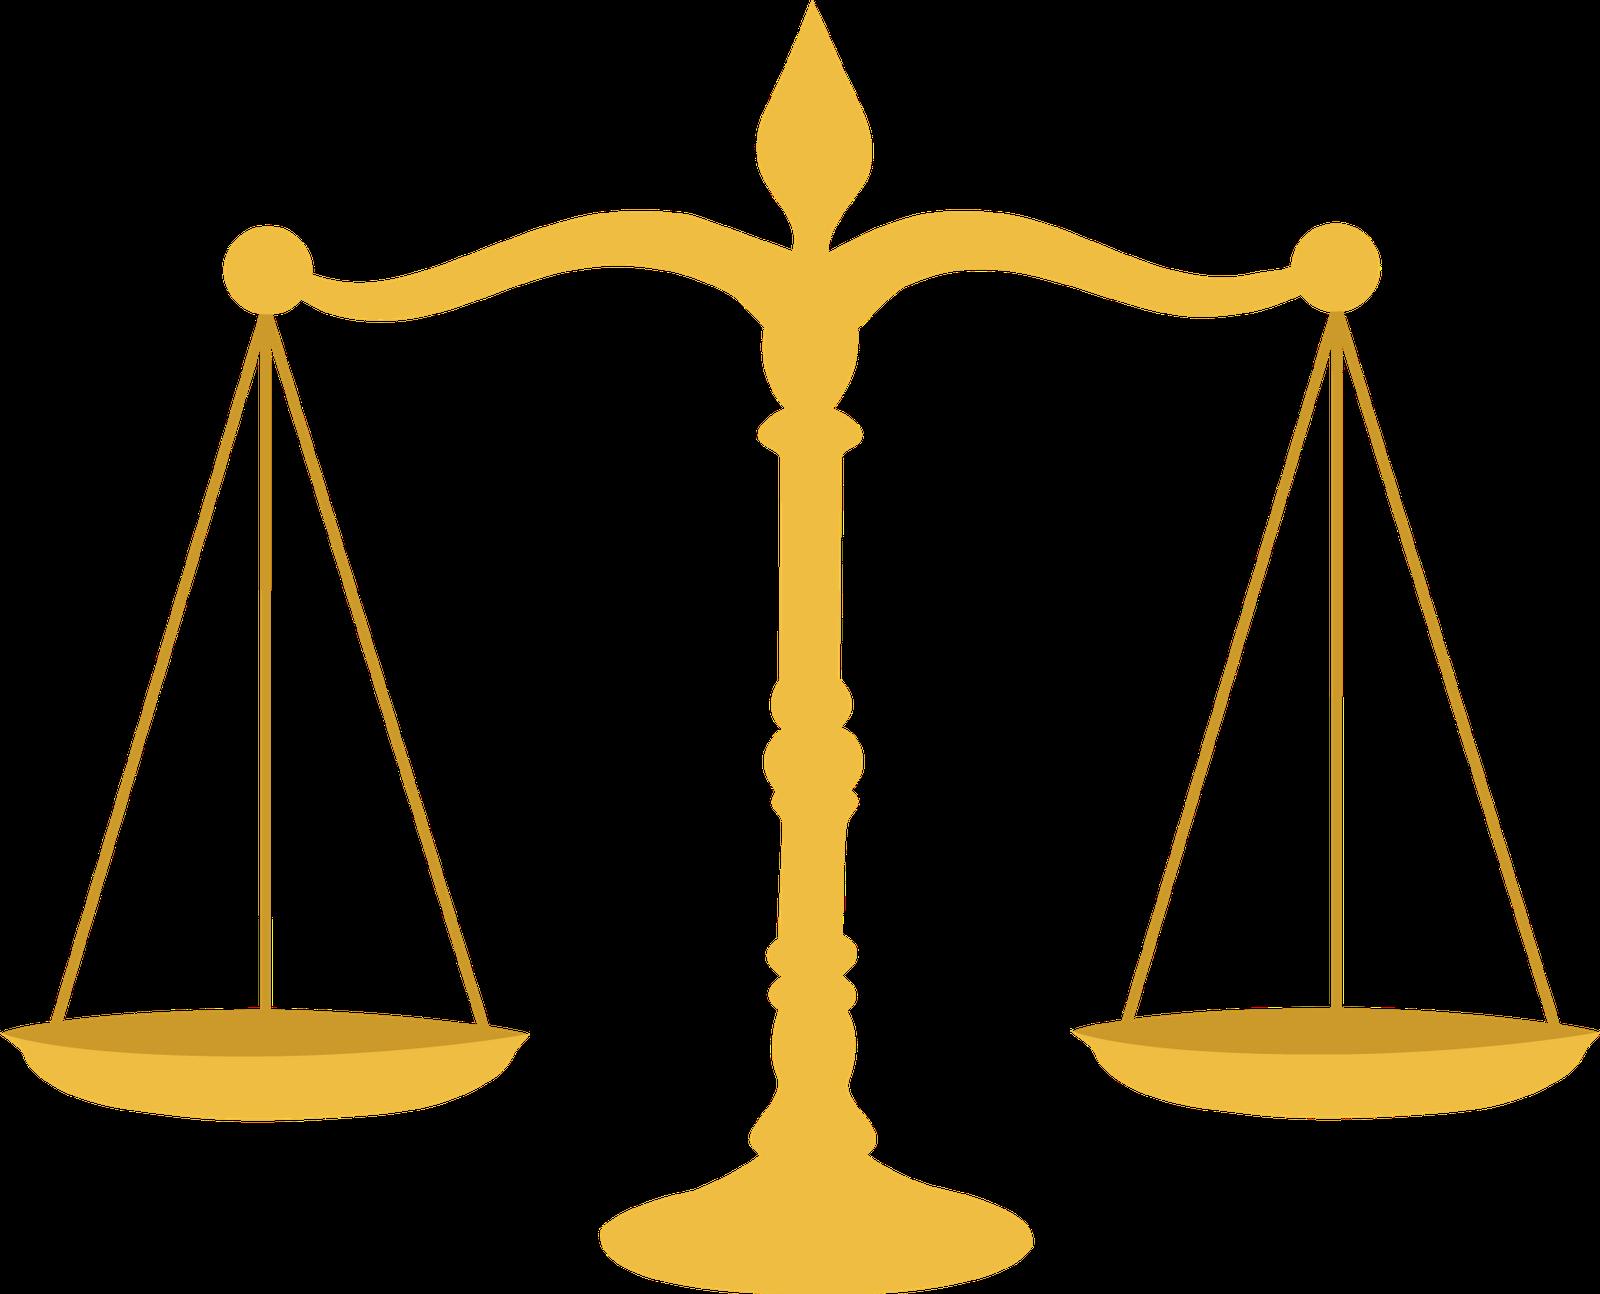 Libra clipart balance beam scale Weight Volume  Prezi by